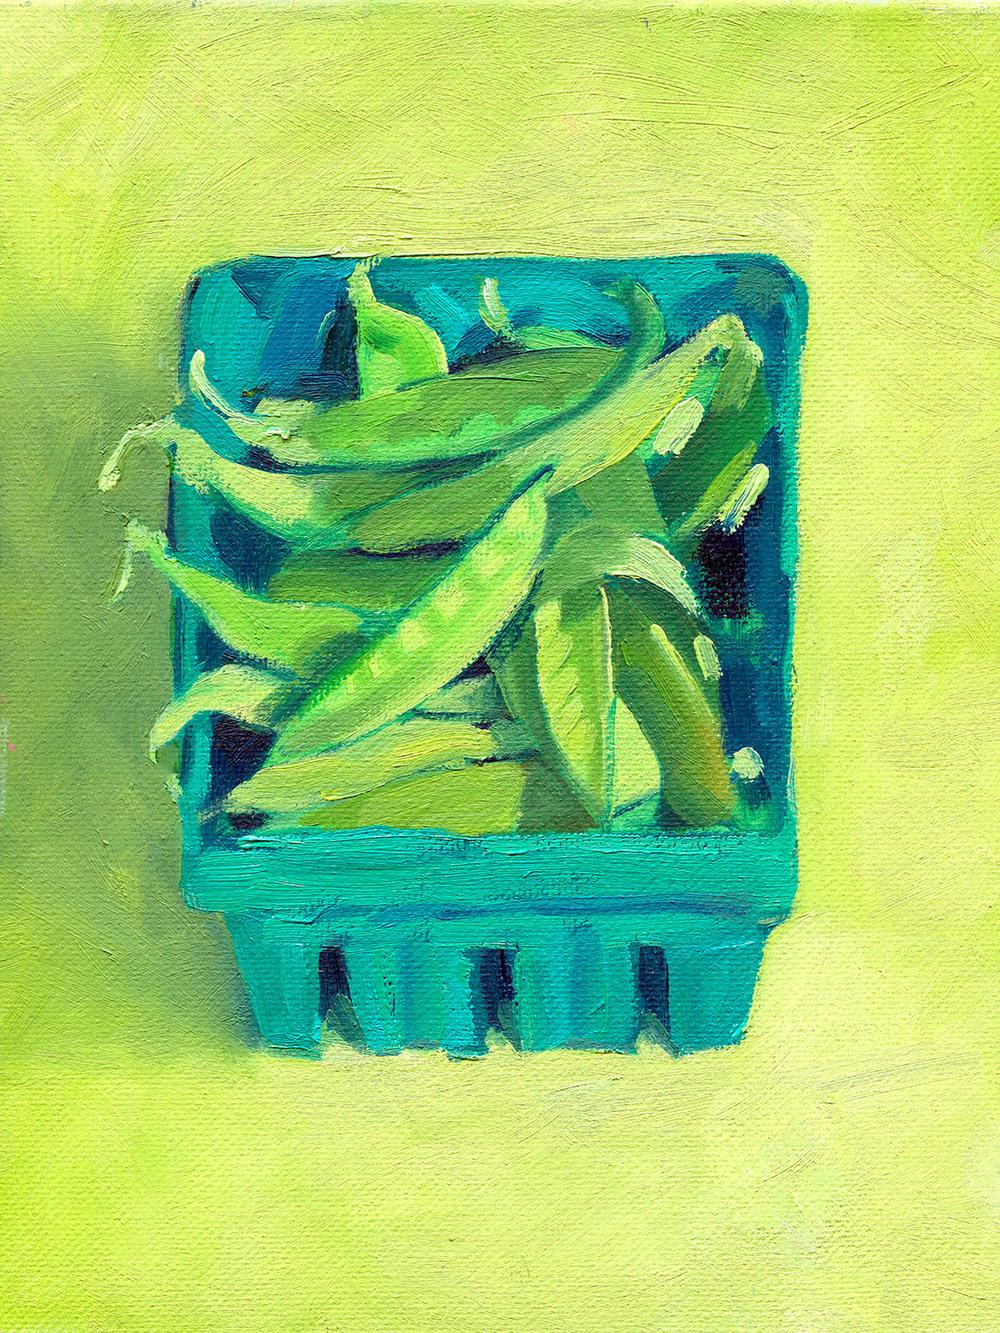 Late Season Peas Harvested from CSA